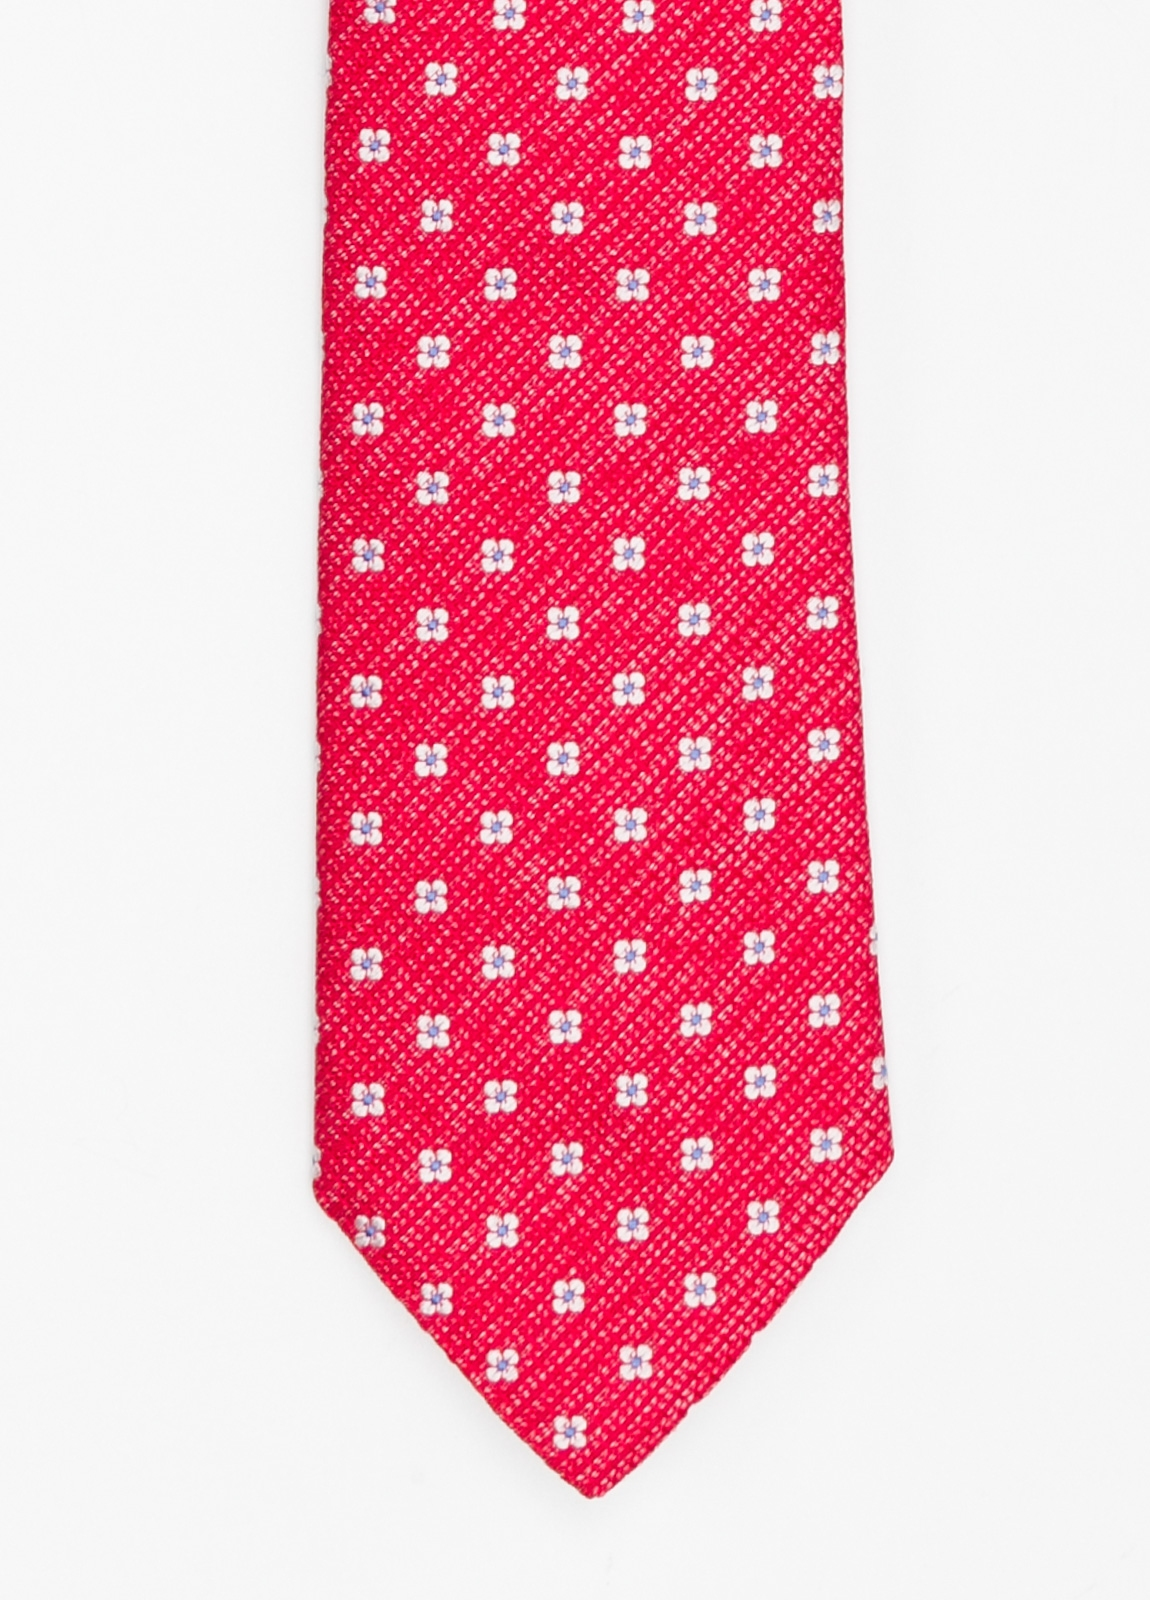 Corbata Formal Wear micro textura flor color rojo. Pala 7,5 cm. 100% Seda.